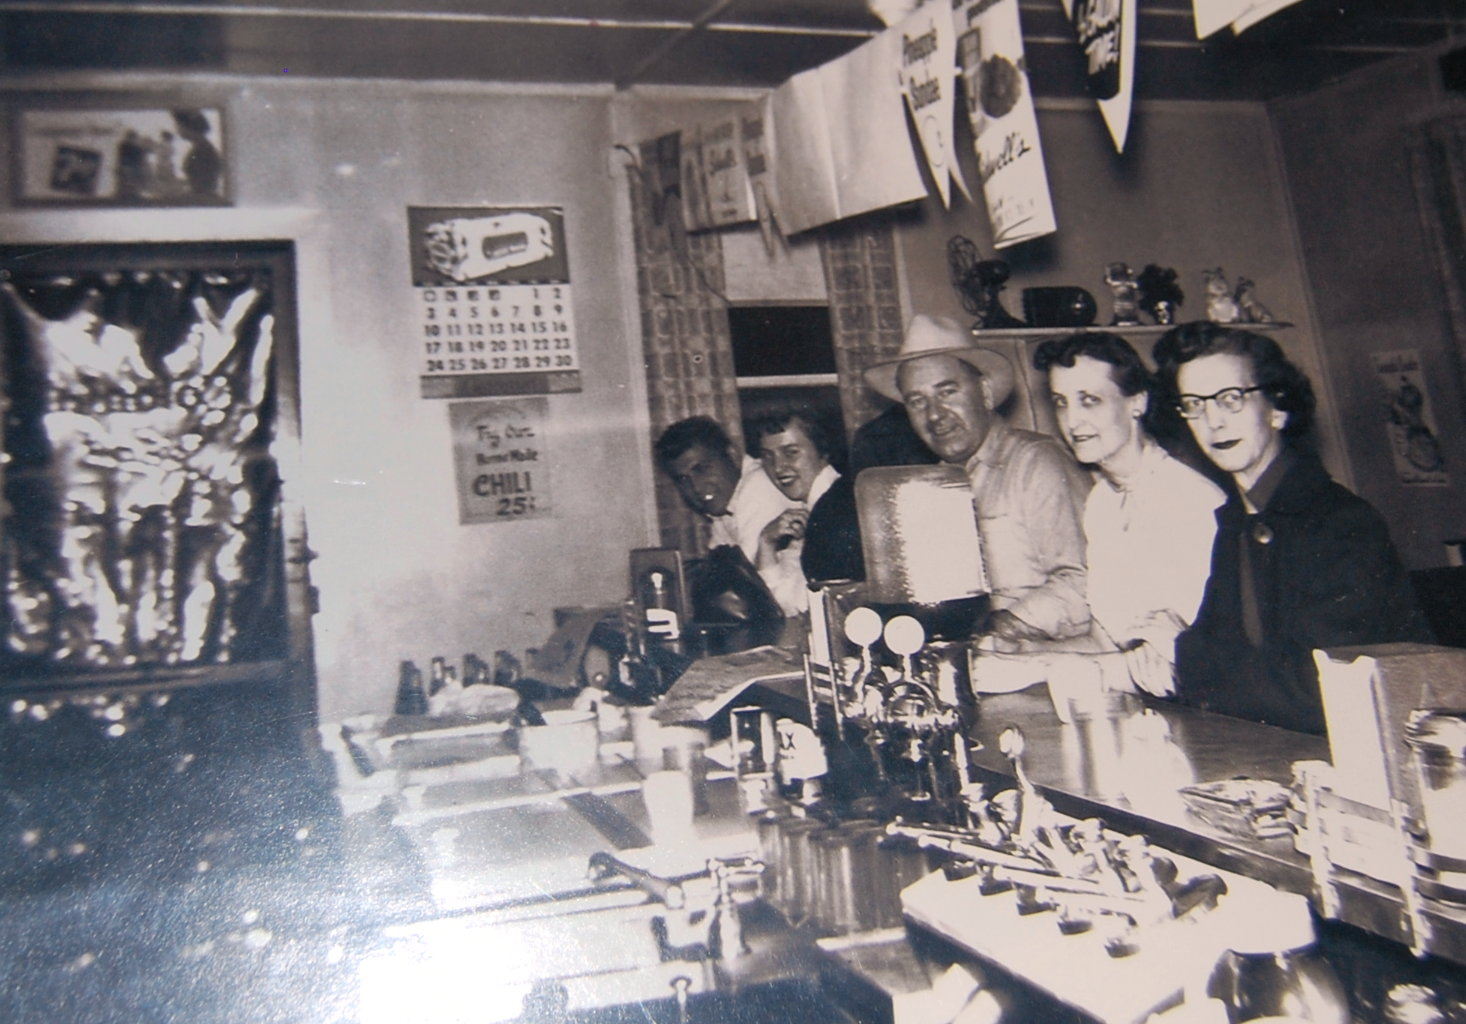 Buddy Holly And Crickets Buddy Holly And The Crickets